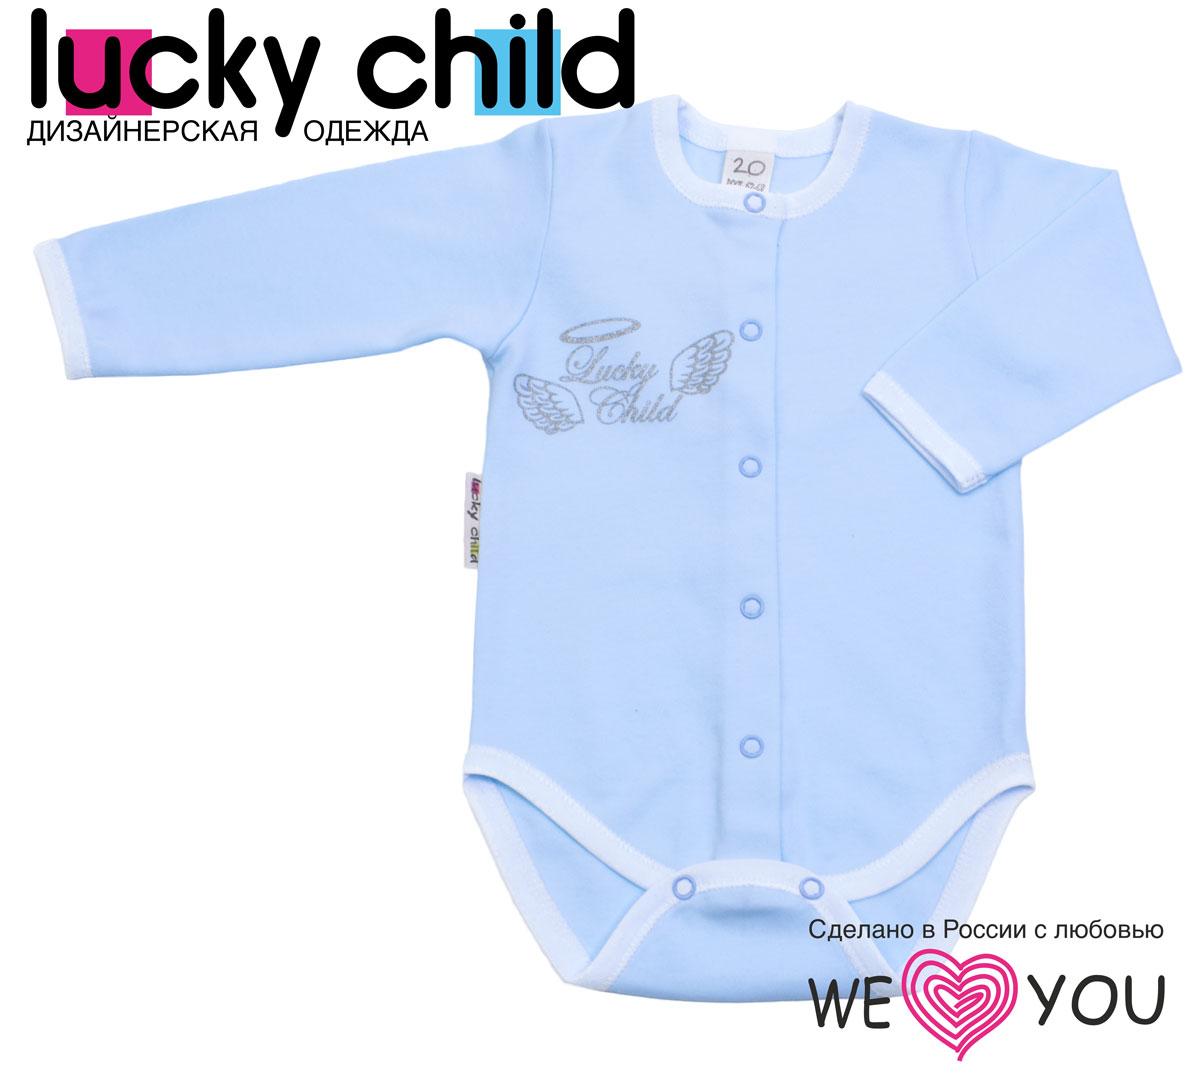 Lucky Child ���� ������� ������. 17-6